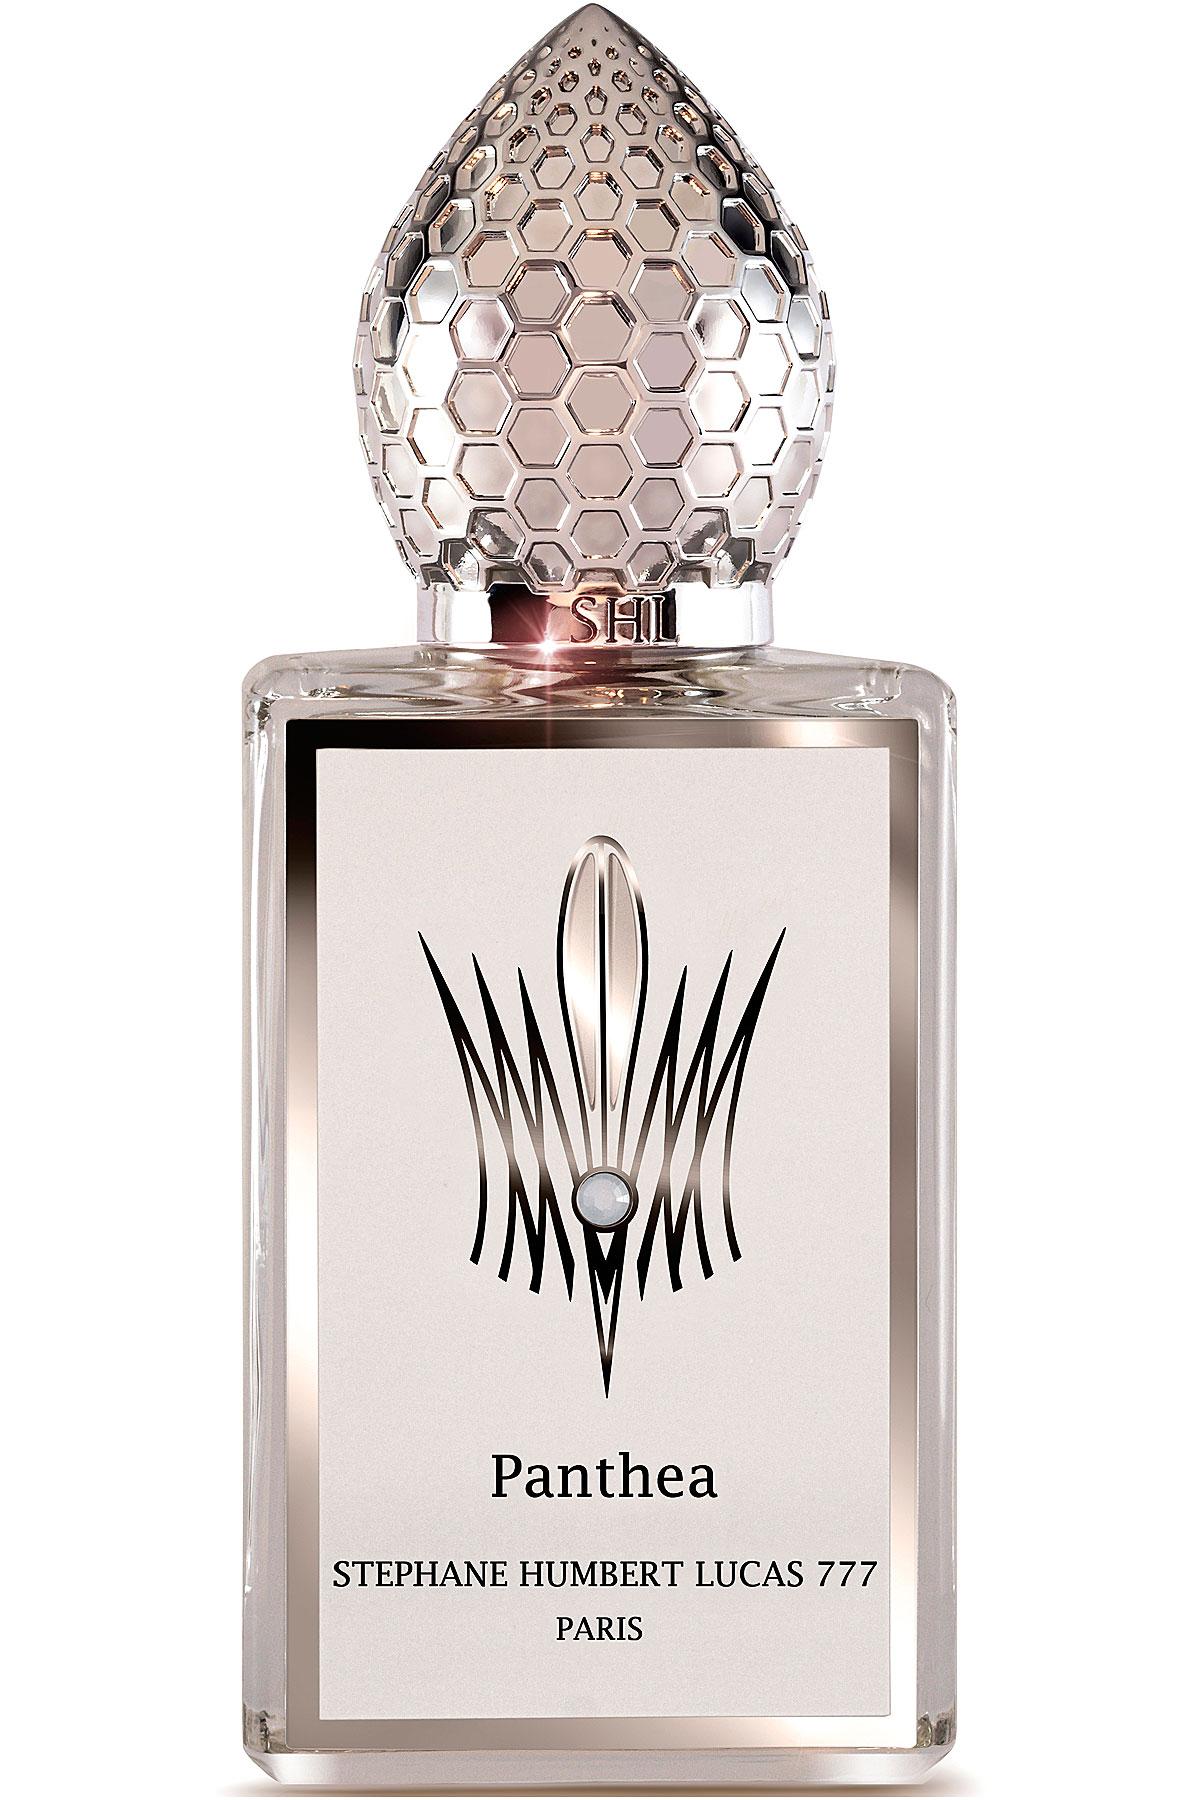 Stephane Humbert Lucas 777 Paris Fragrances for Women, Panthea - Eau De Parfum - 50 Ml, 2019, 50 ml